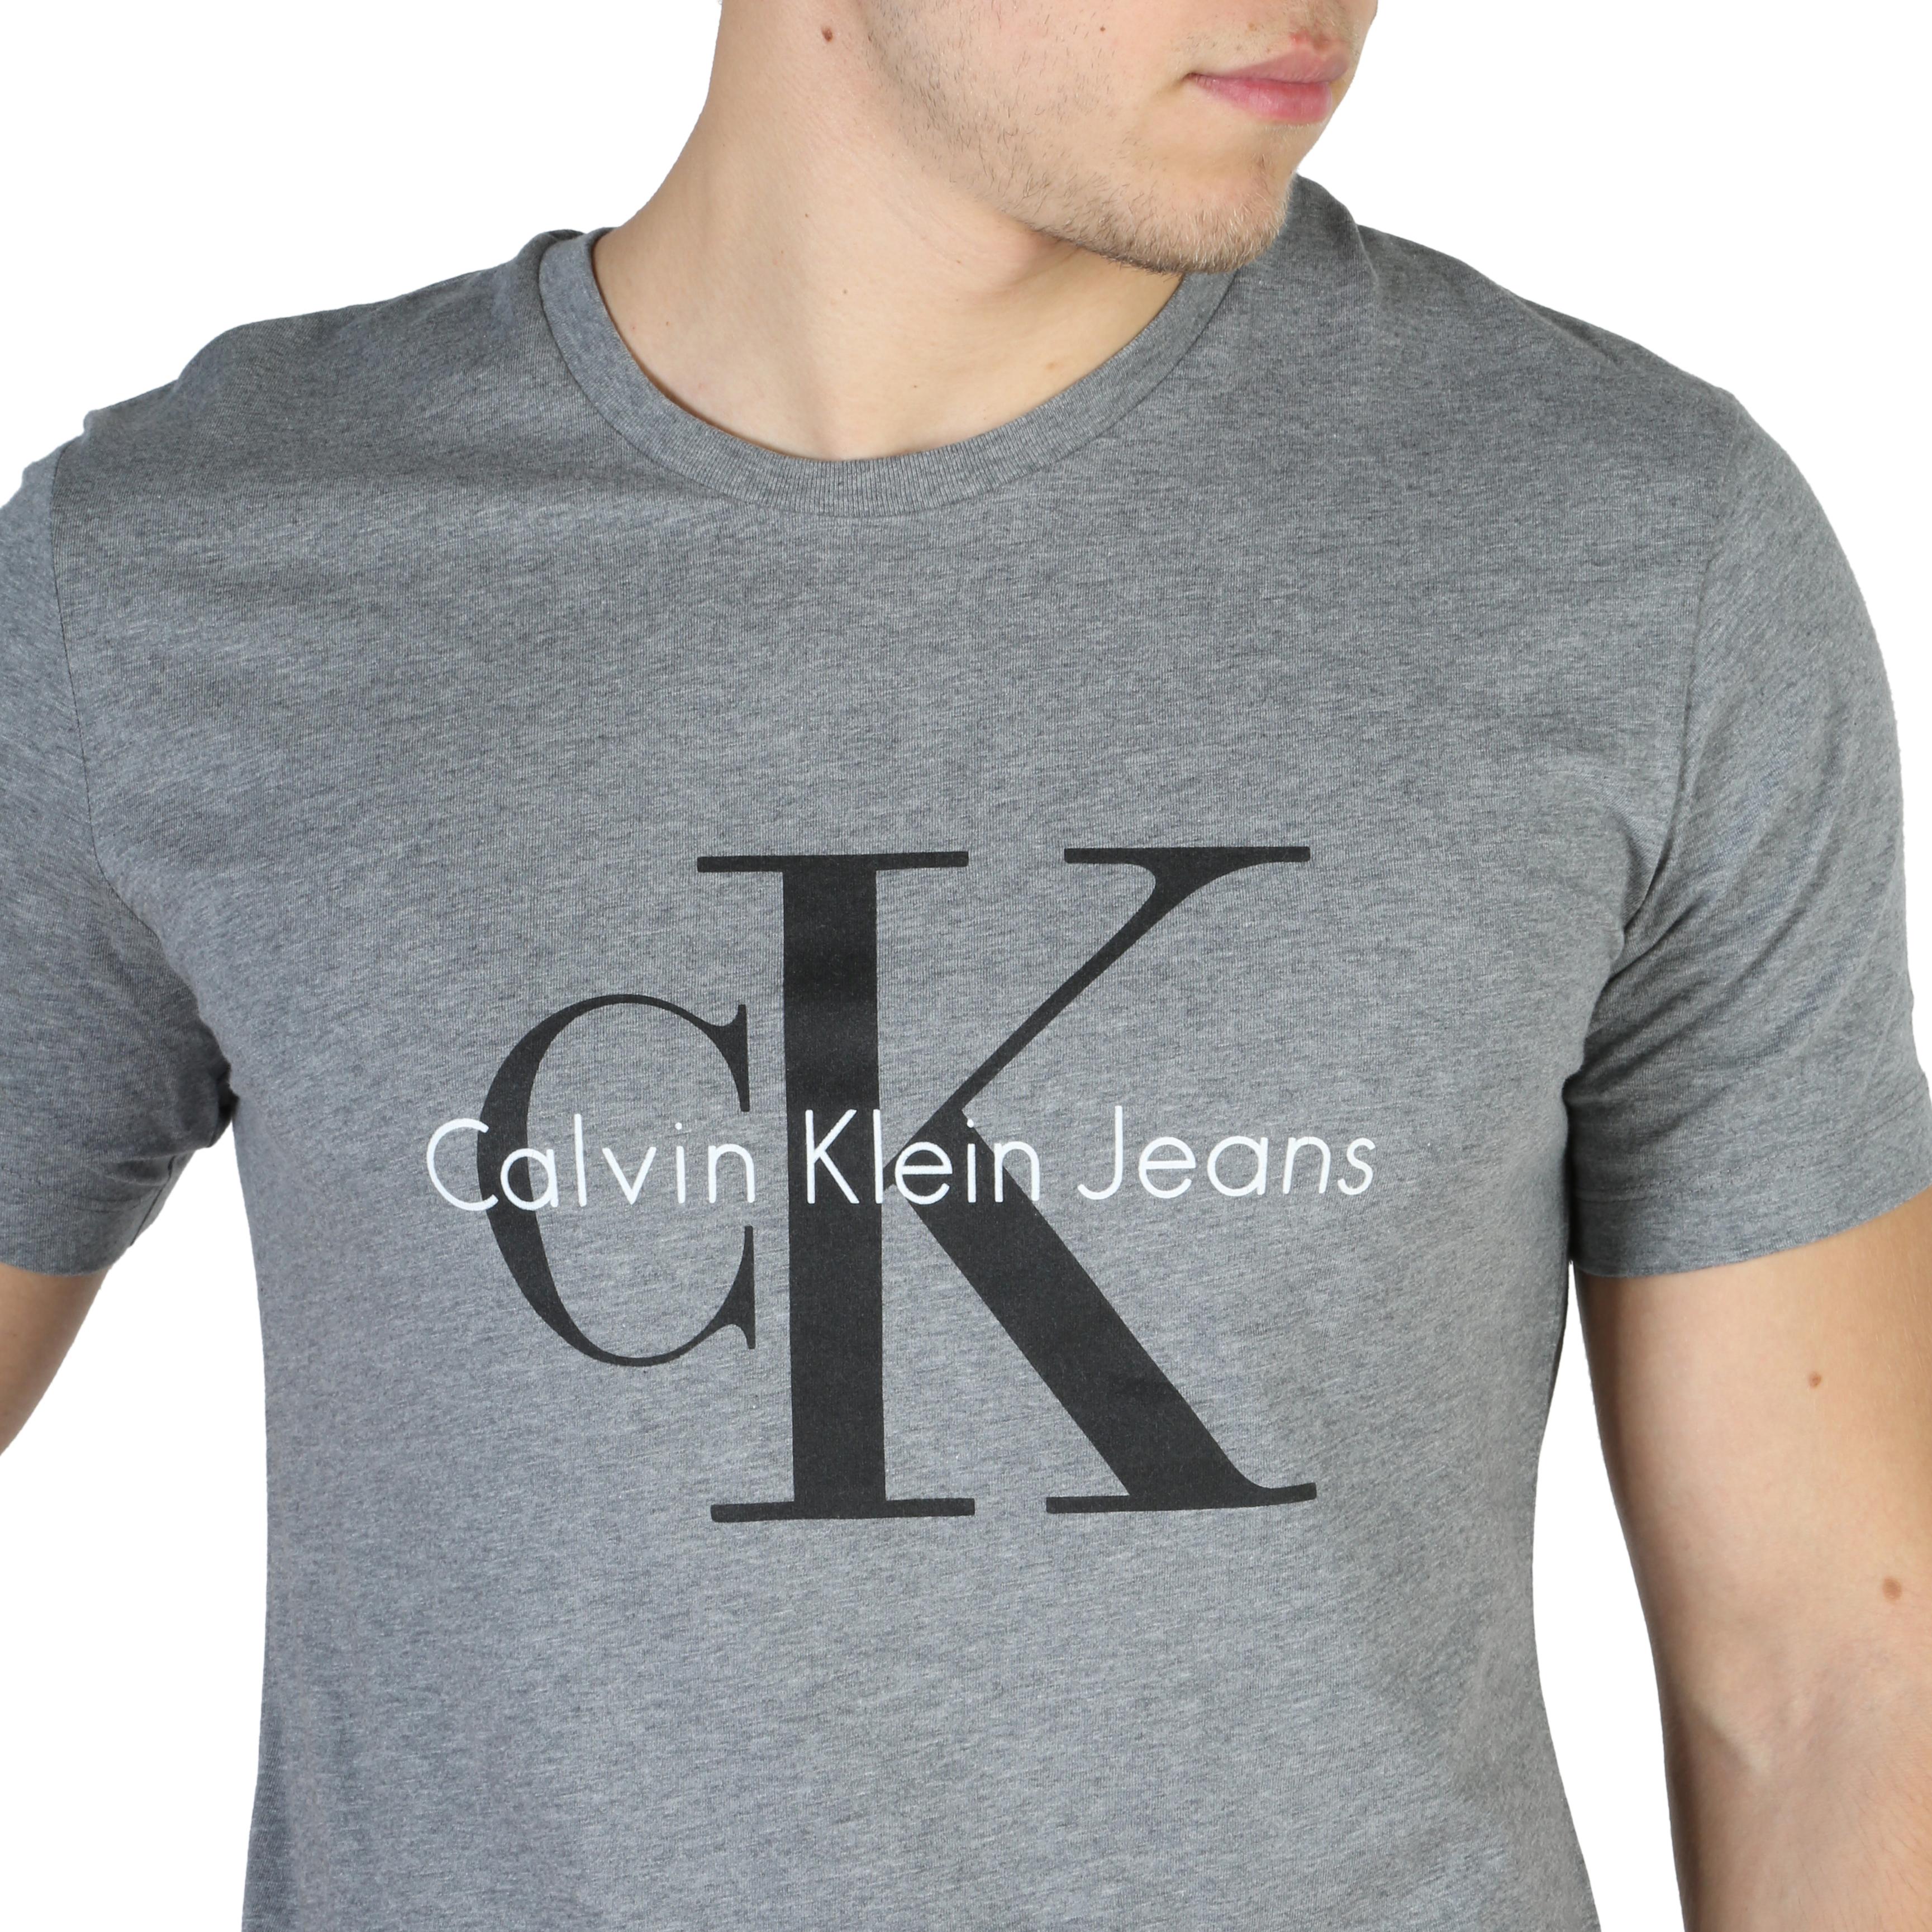 T-SHIRT-Calvin-Klein-J3IJ302251-Uomo-Grigio-104159-CASUAL-VINTAGE miniatura 3